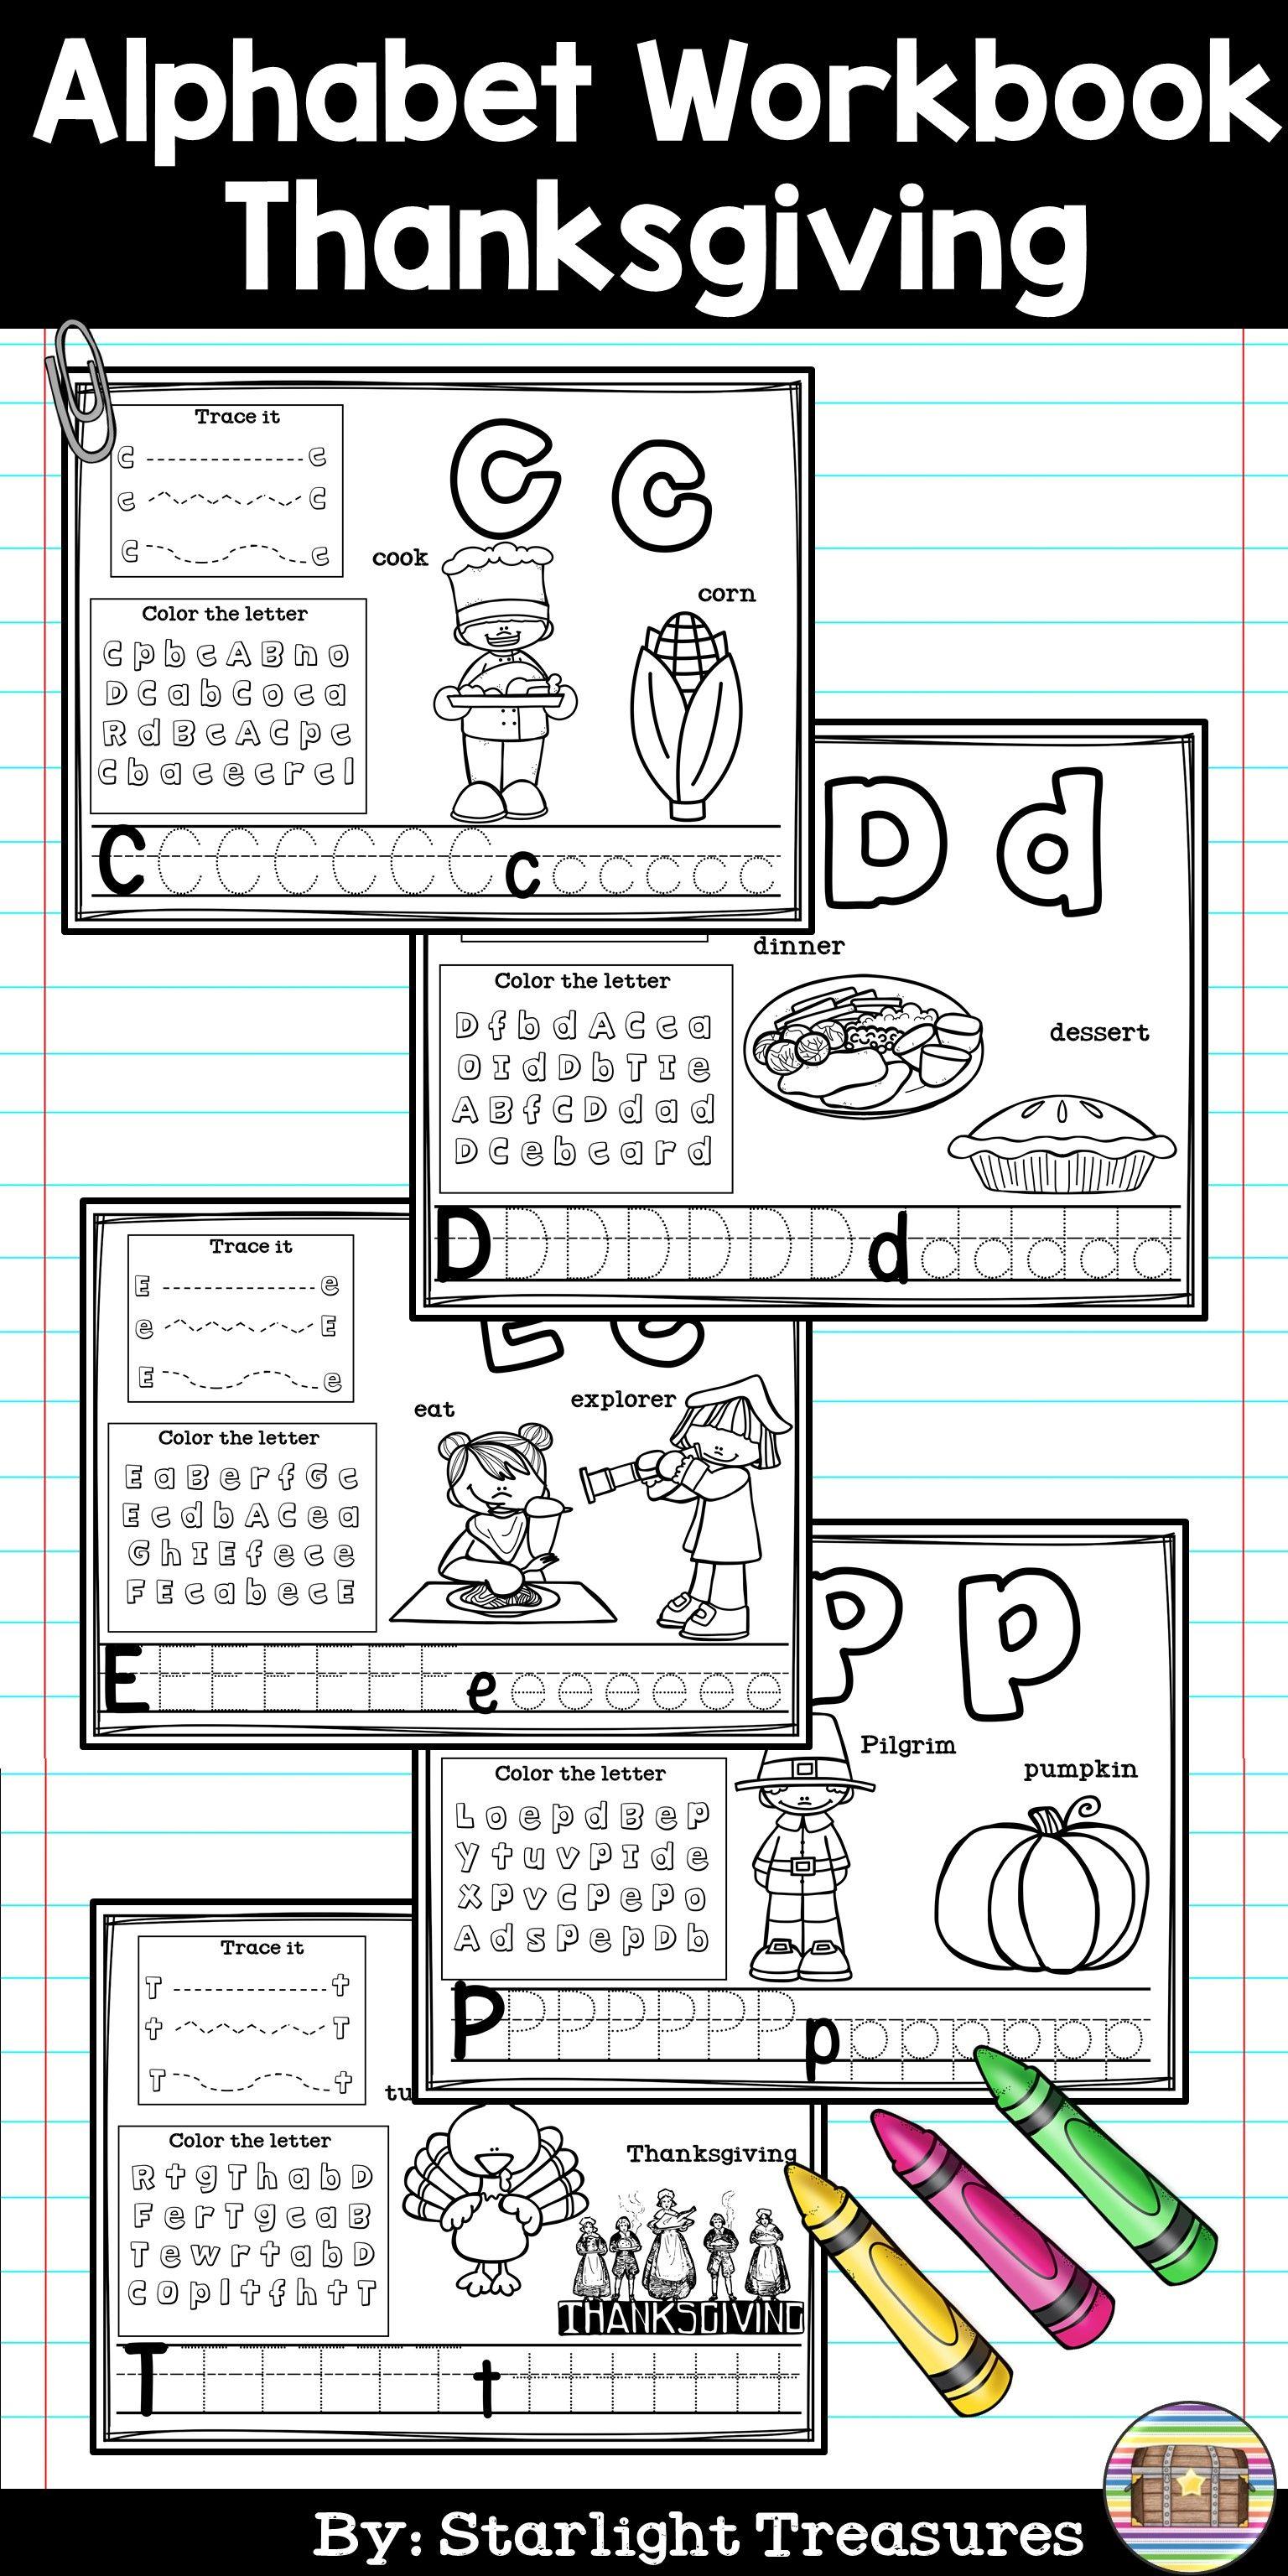 Alphabet Workbook Worksheets A Z Thanksgiving Theme